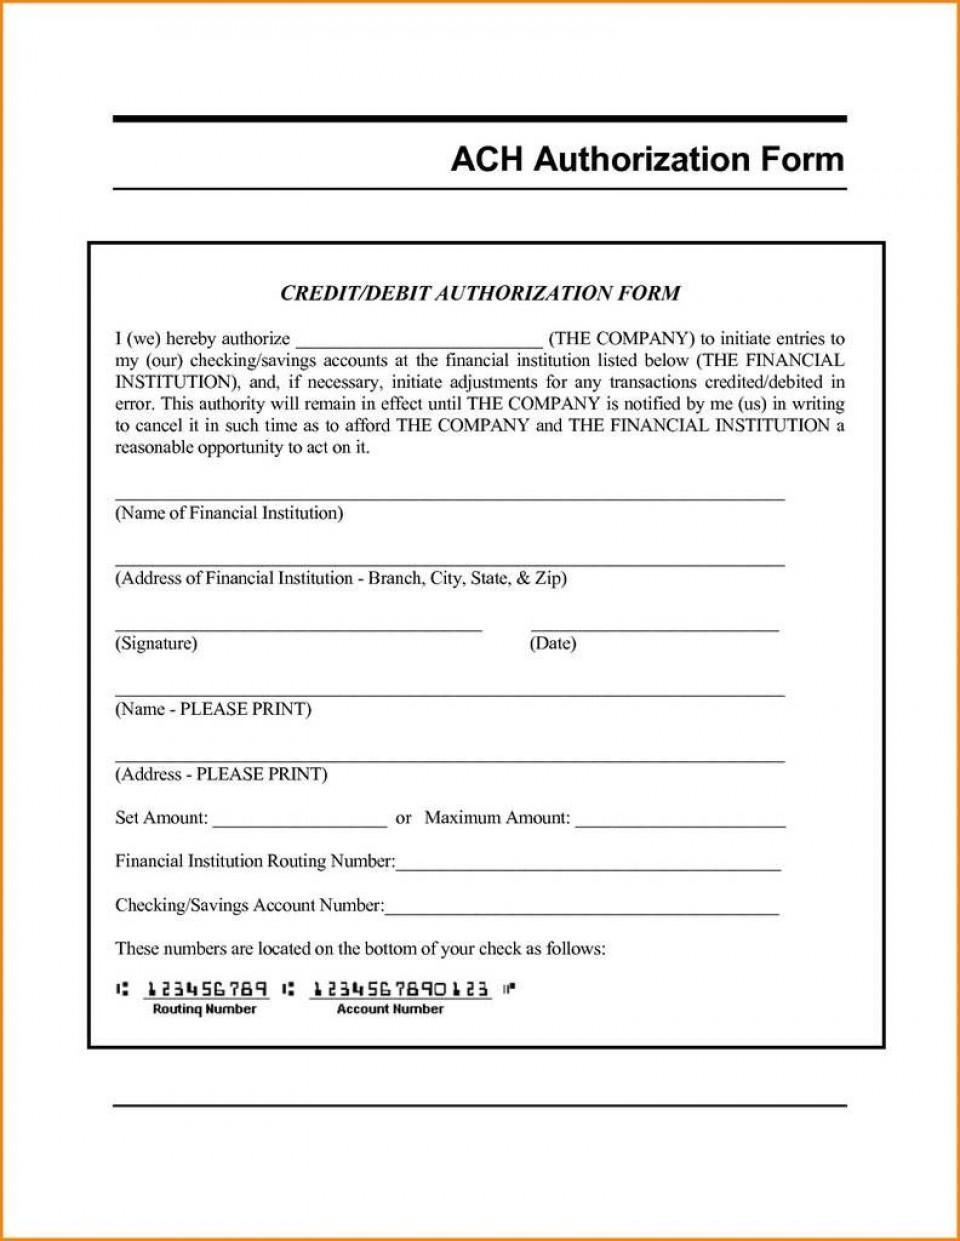 009 Impressive Credit Card Form Template Html Idea  Example Payment Cs960